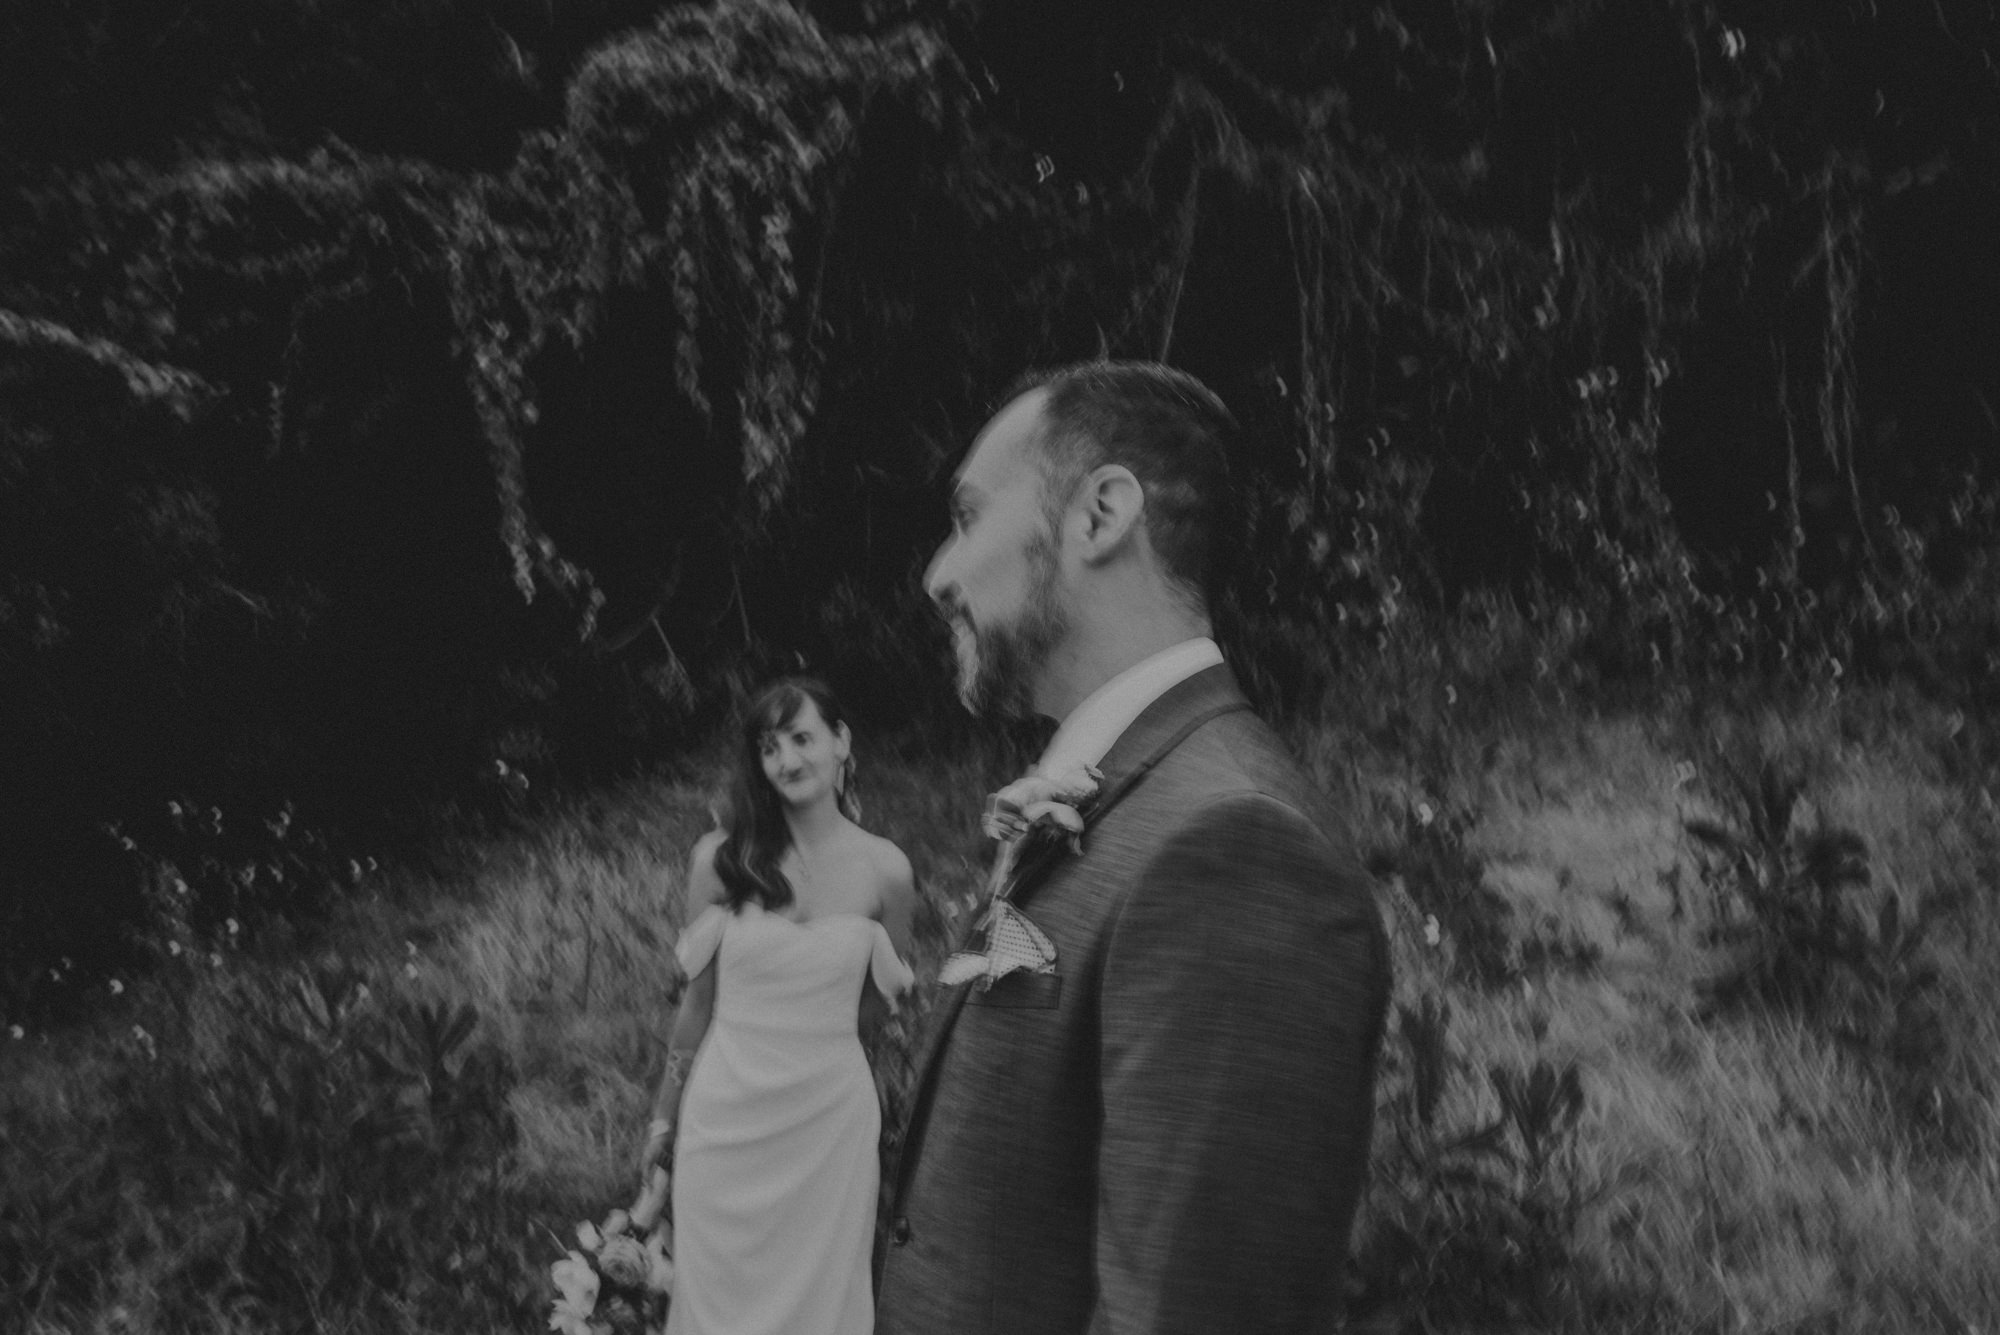 elopement photographer in los angeles - la wedding photographer - isaiahandtaylor.com-035.jpg